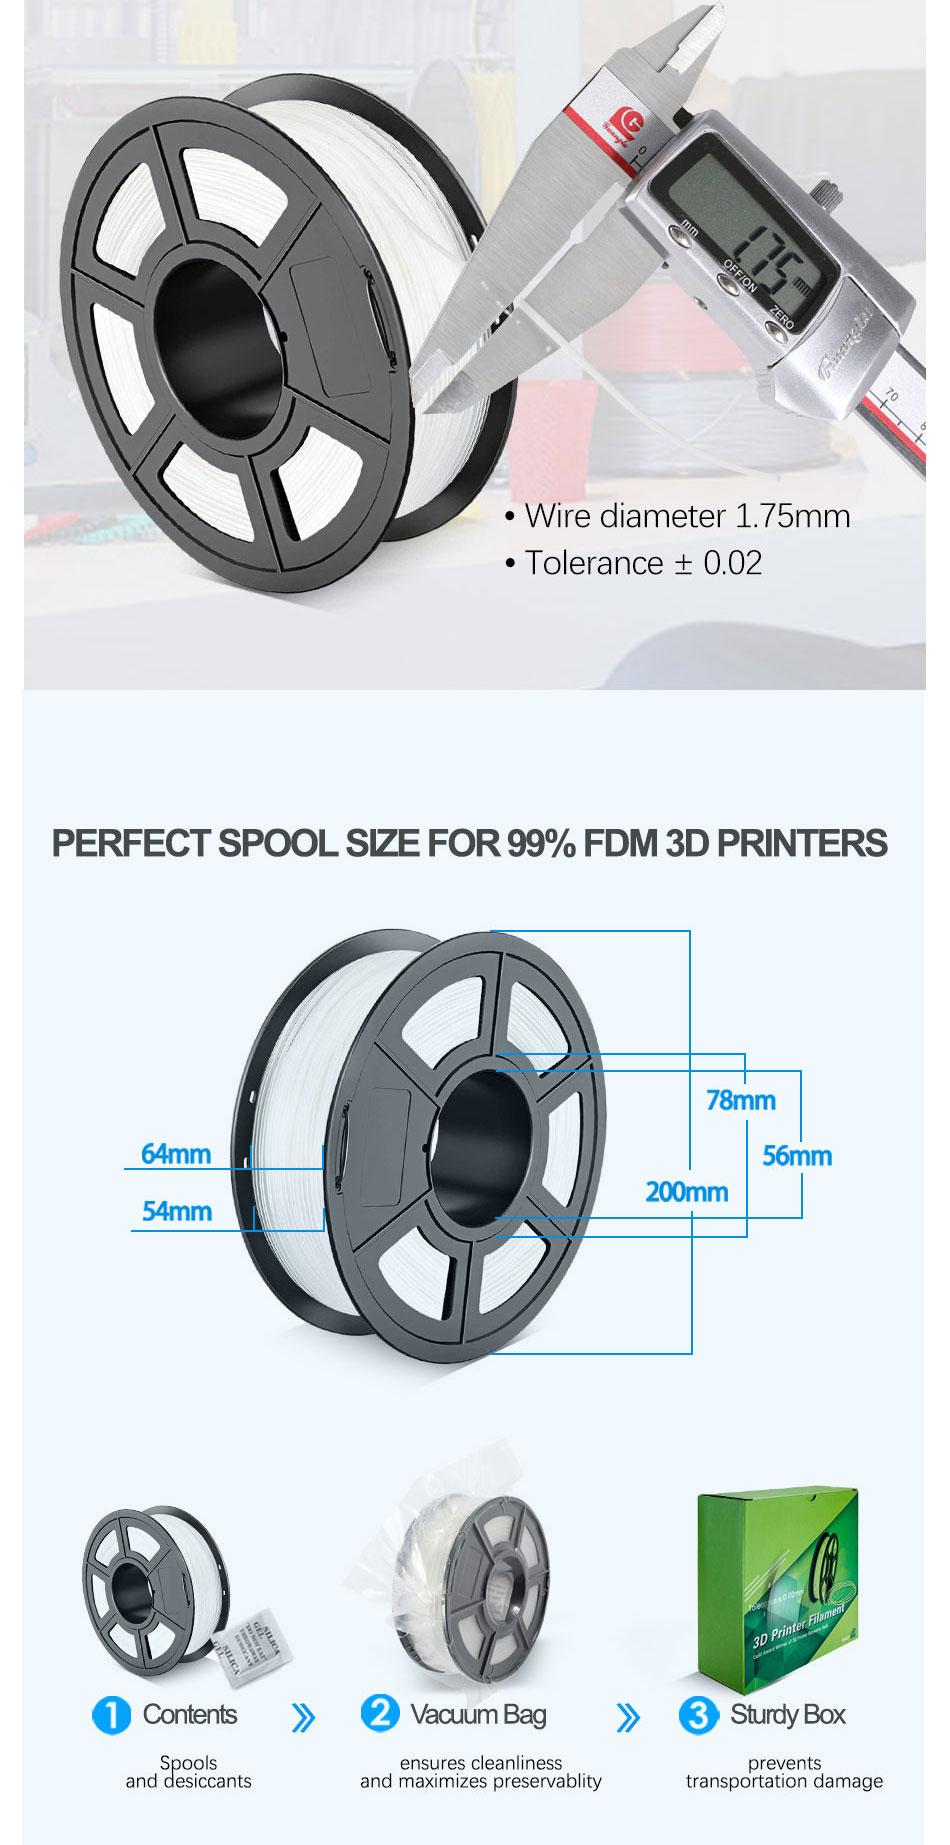 SUNLU PA Nylon 3D Printer Filament Made with High Tensile Strength Nylon